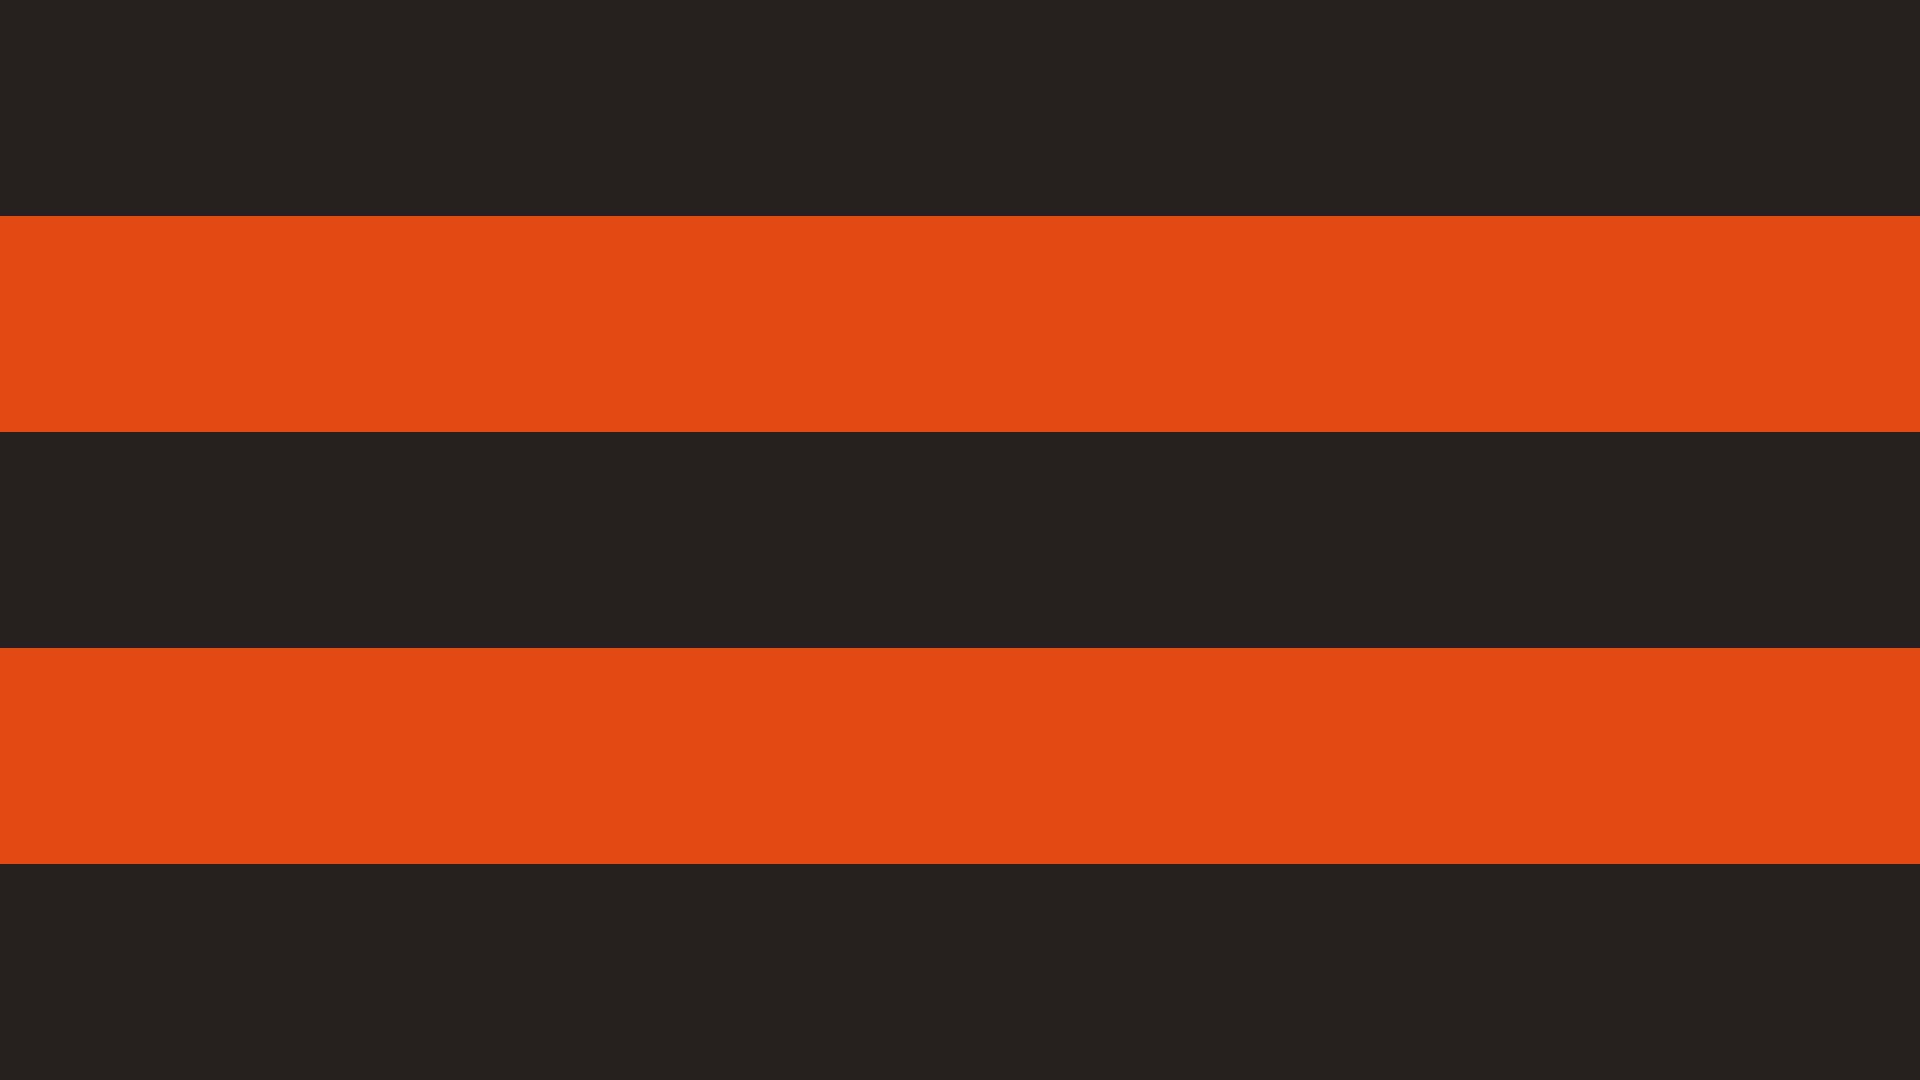 Browns Minimalist Wallpaper new version horizontal sleeve stripes 1920x1080